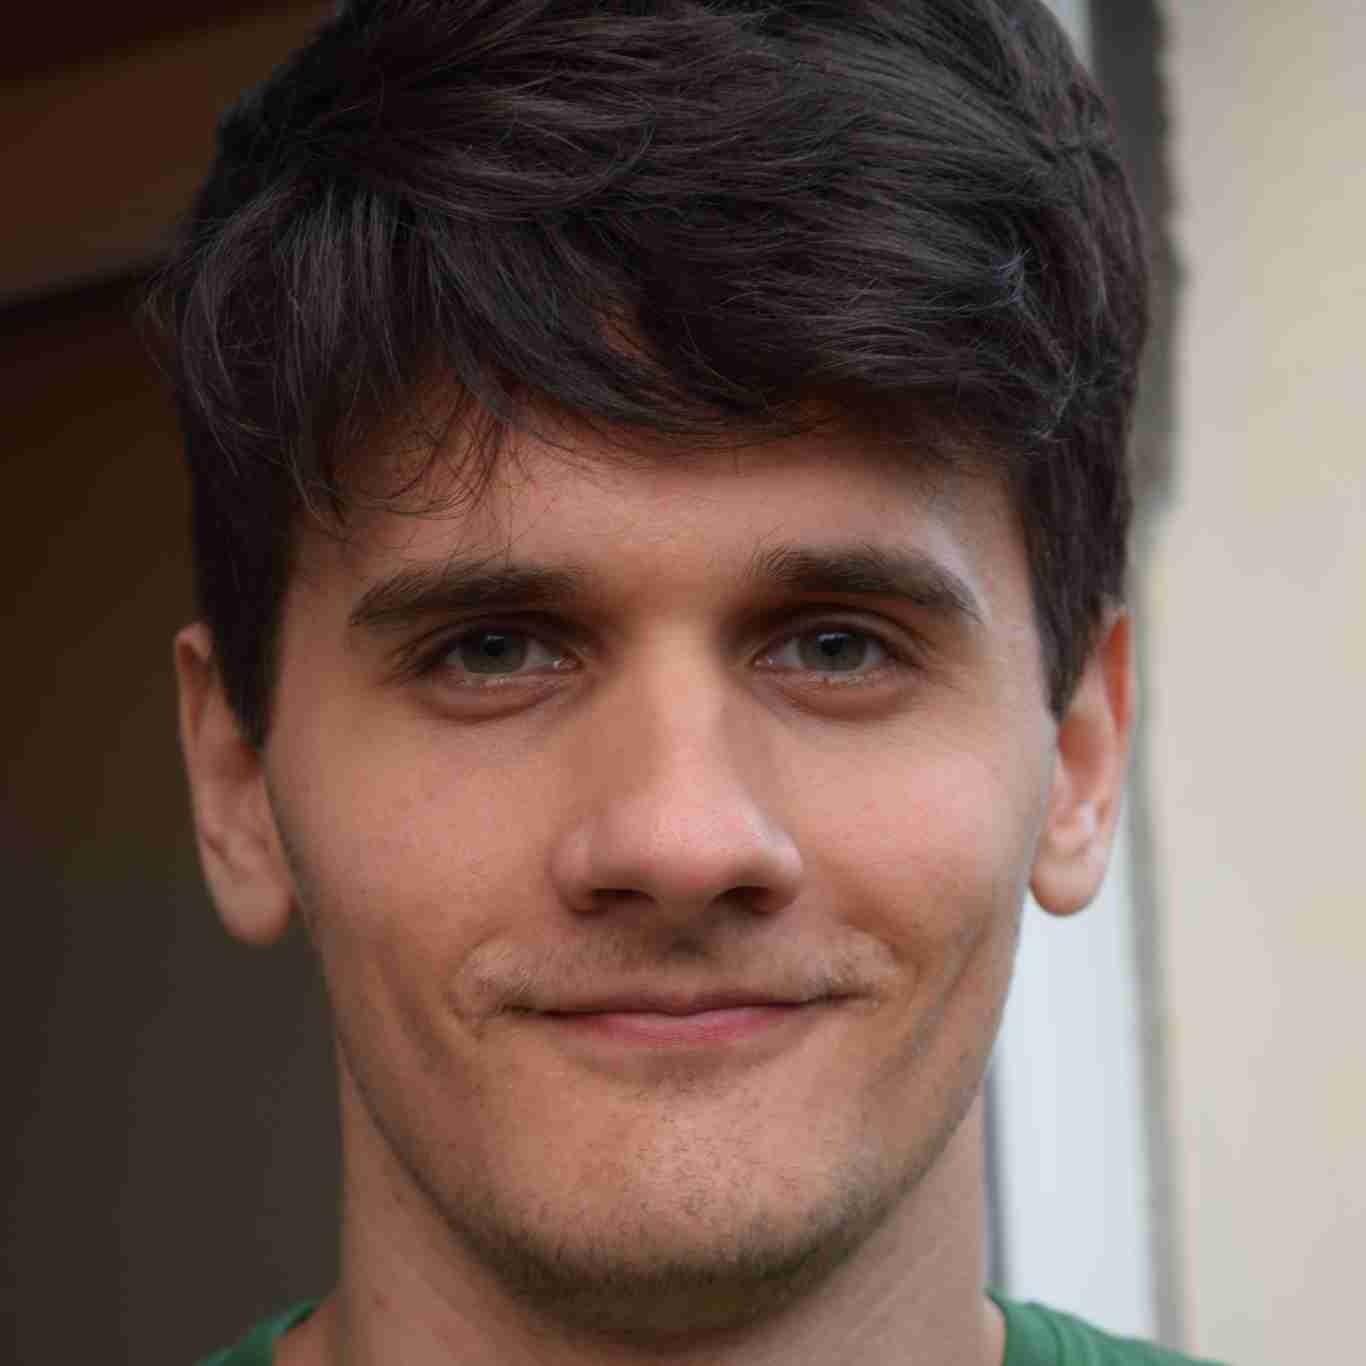 Jakub Jadwiszczak